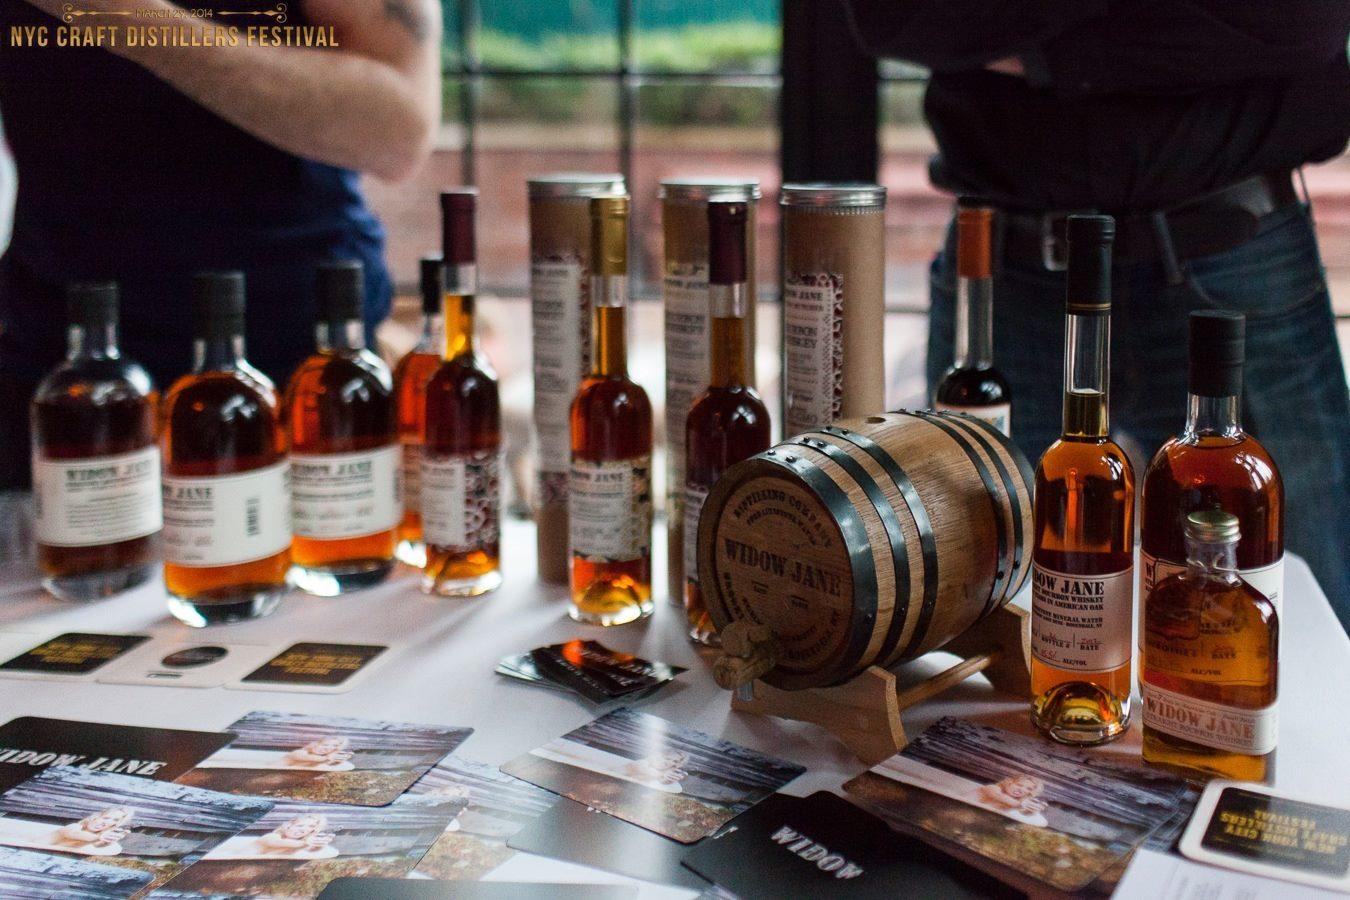 Sampling Widow Jane at last year's NYC Craft Distillers Festival. (Ryan Kelly)